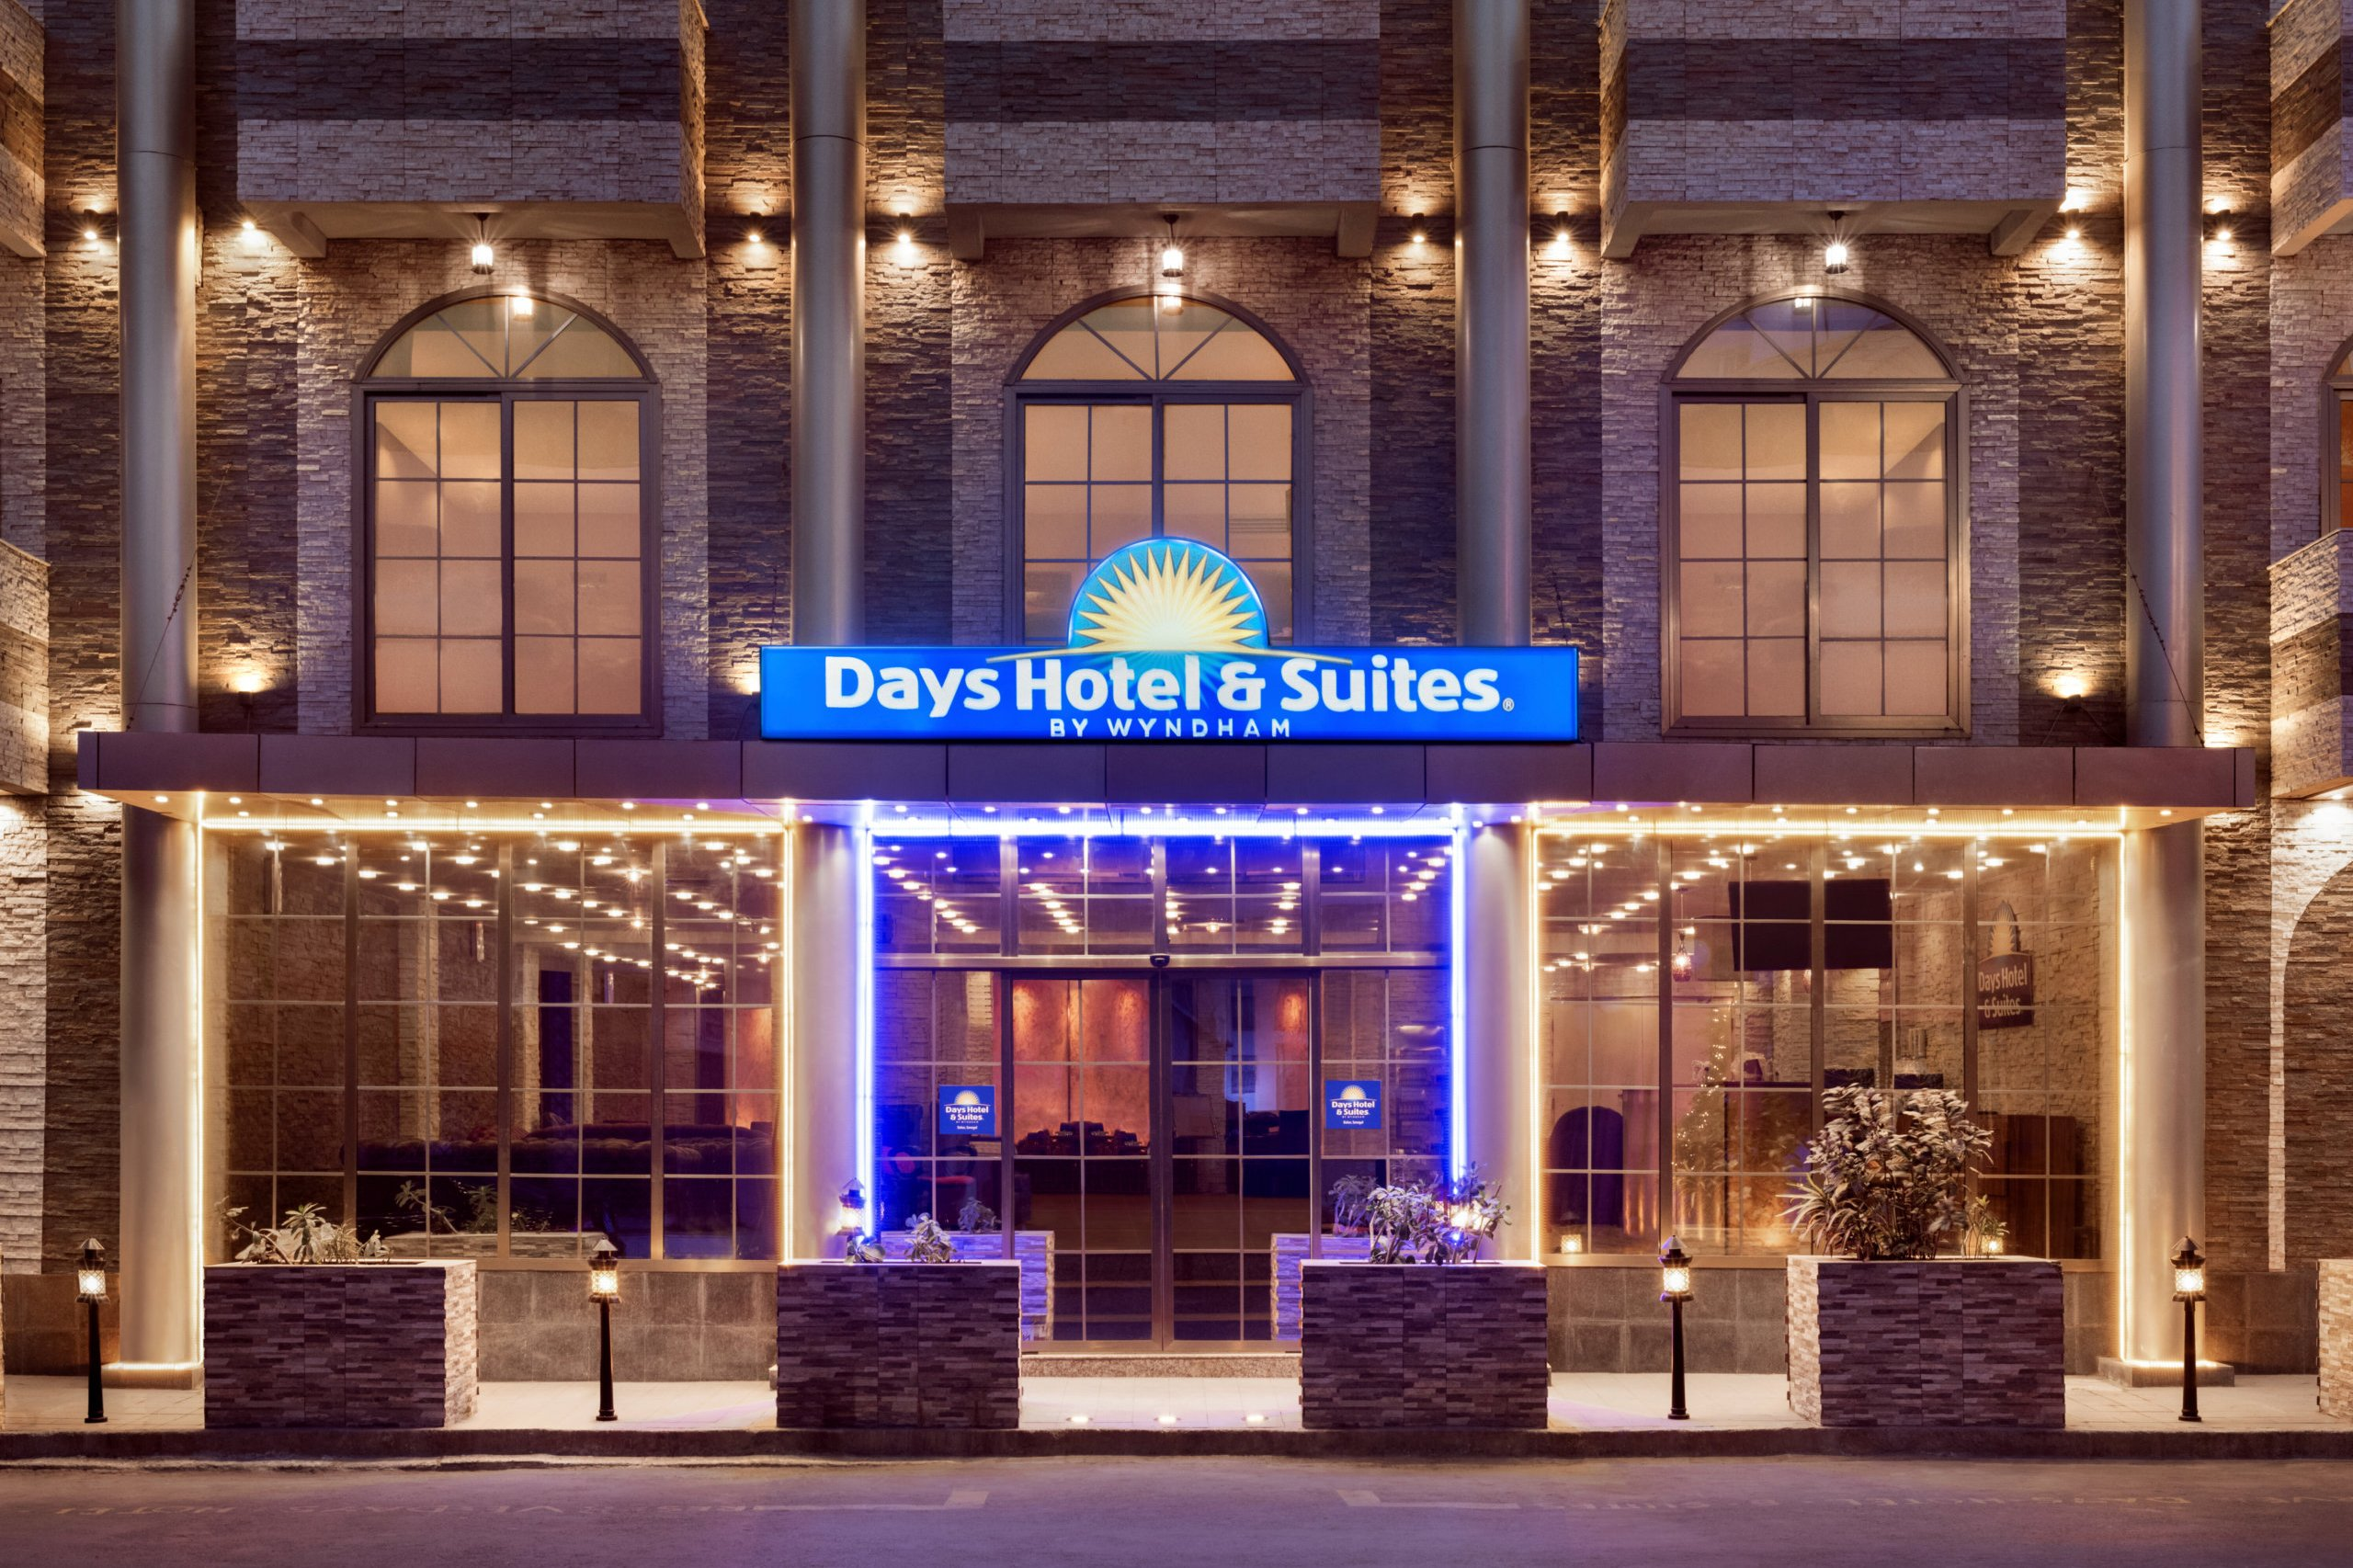 Days Hotel & Suites Dakar - Exterior - 1432215